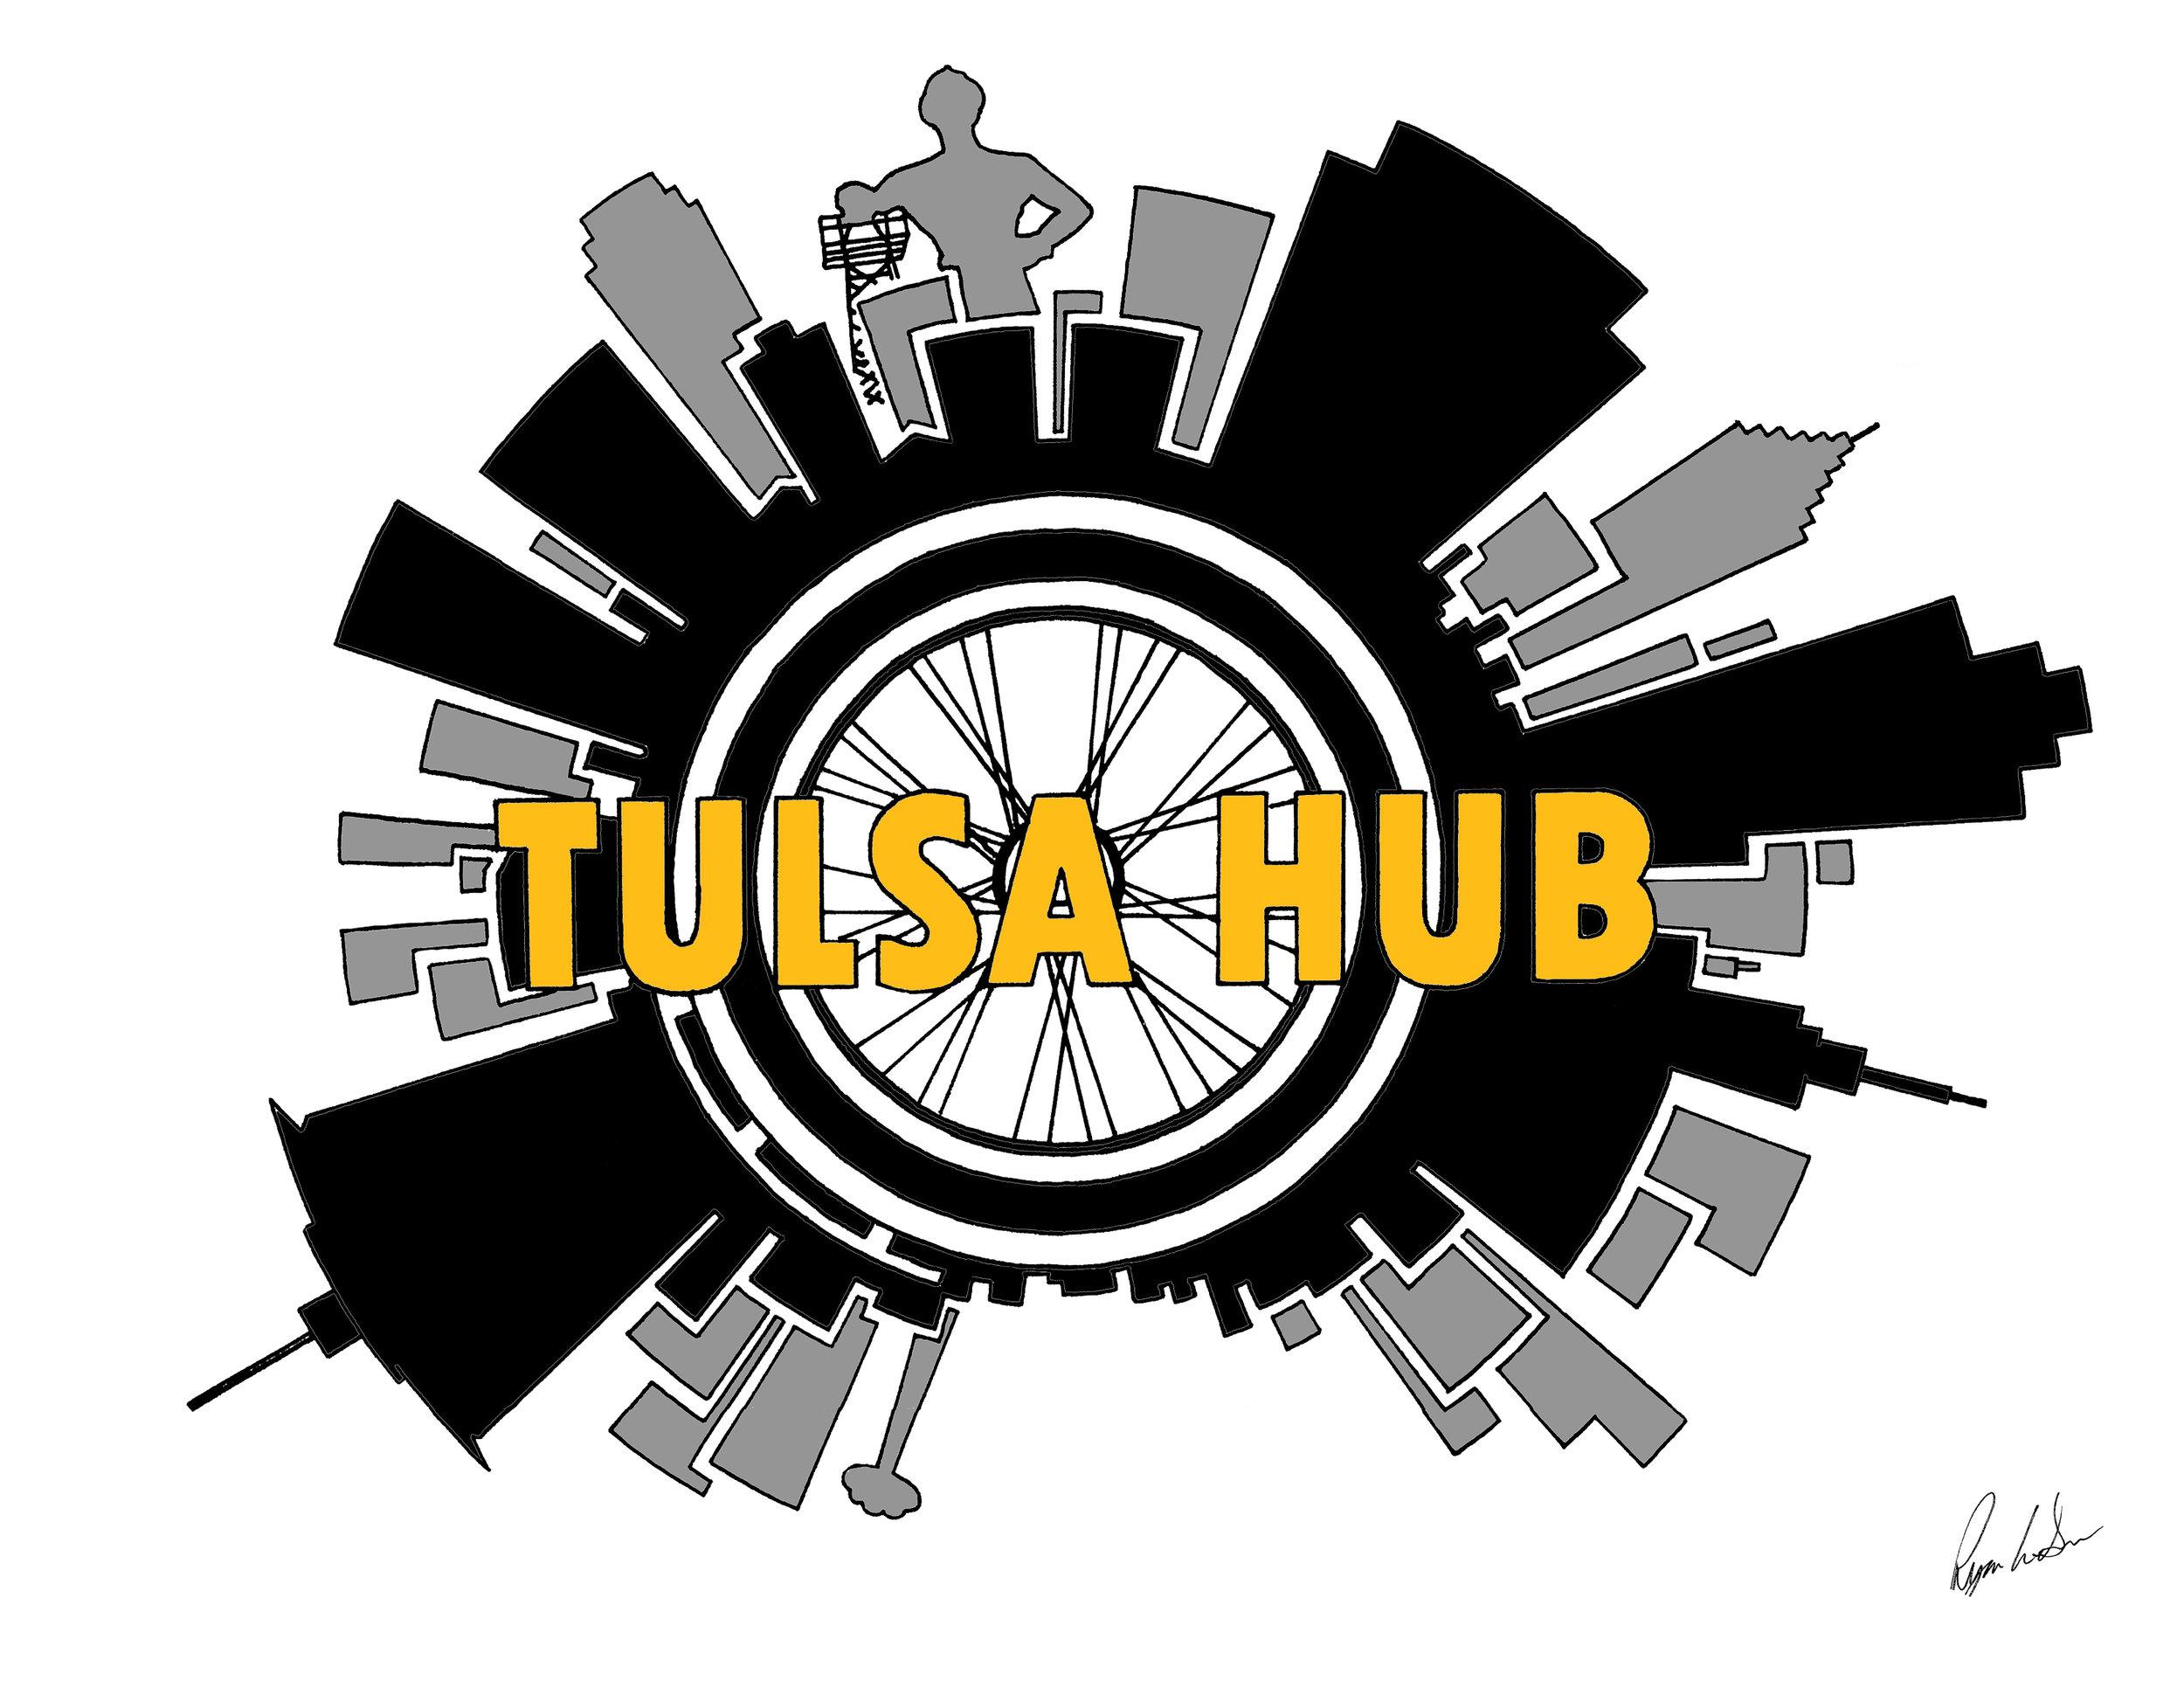 History — Tulsa Hub